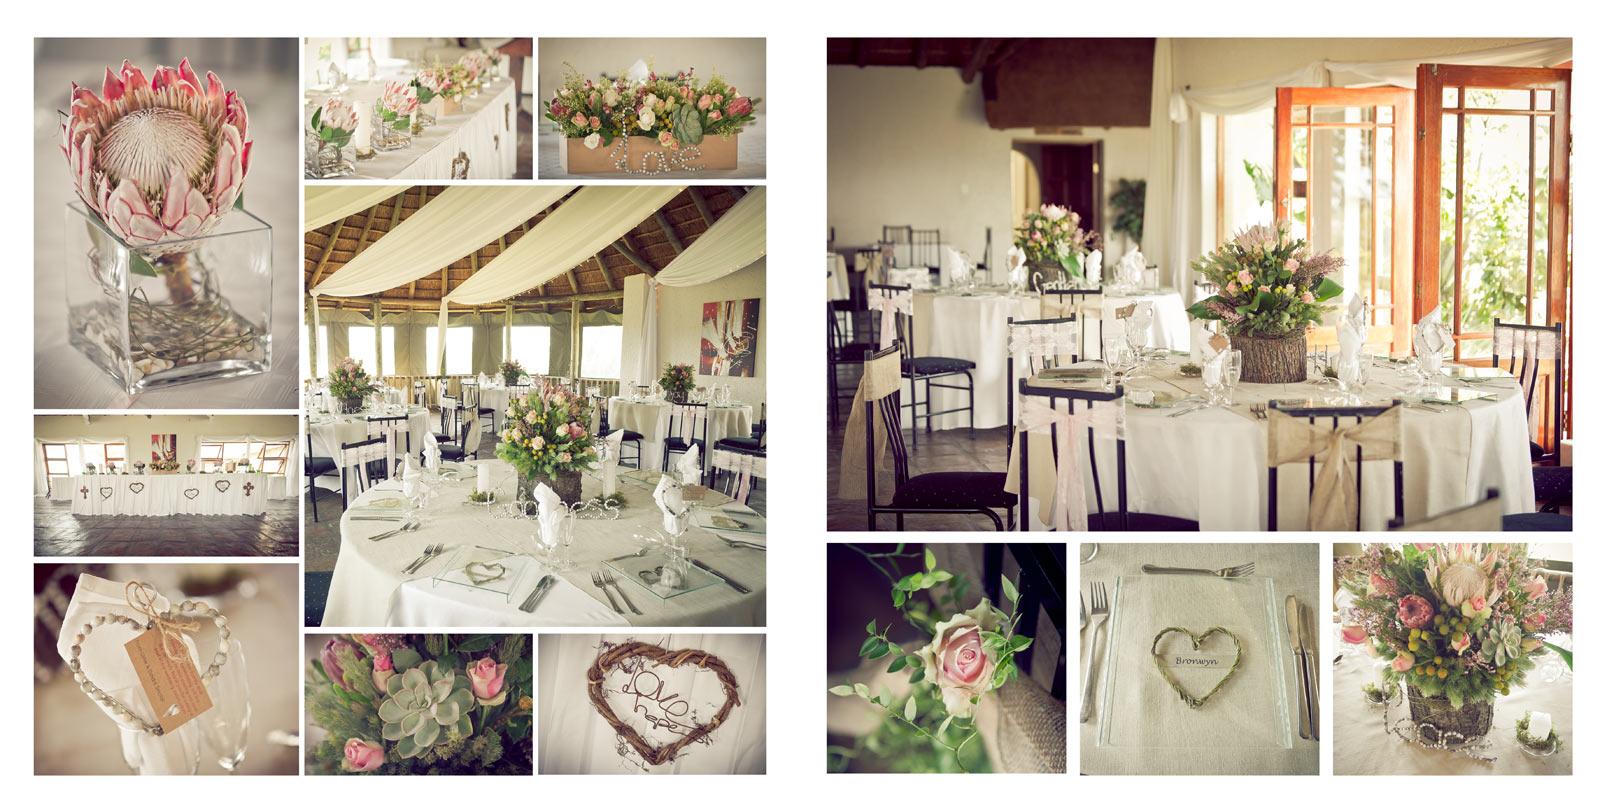 Nathalie Boucry Photography | Deidre and Lister Wedding Album 022